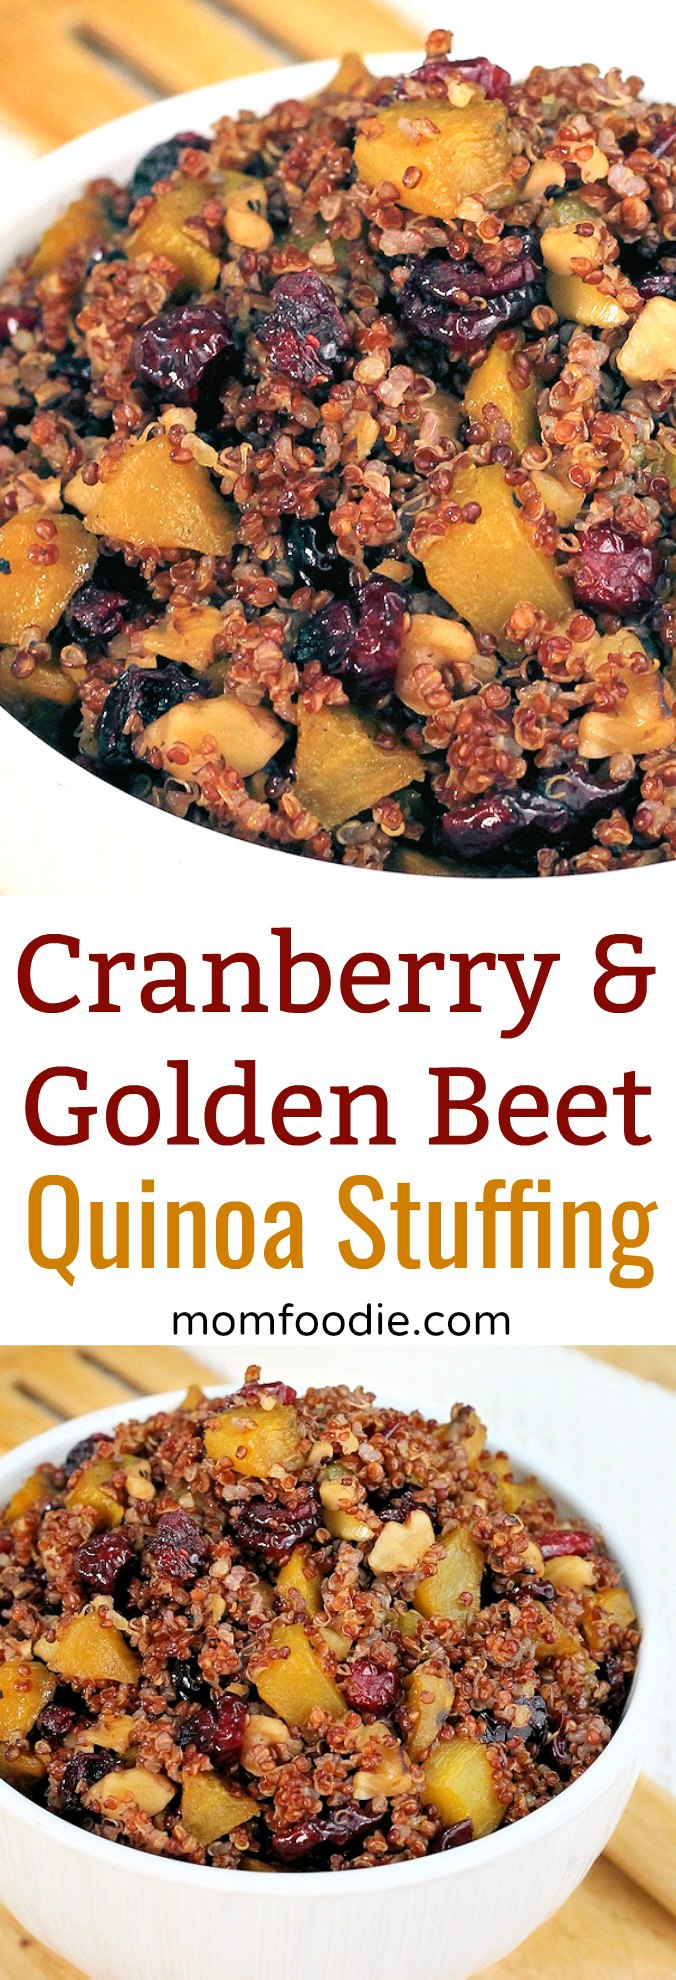 Golden Beet and Cranberry Quinoa Stuffing Recipe, gluten free